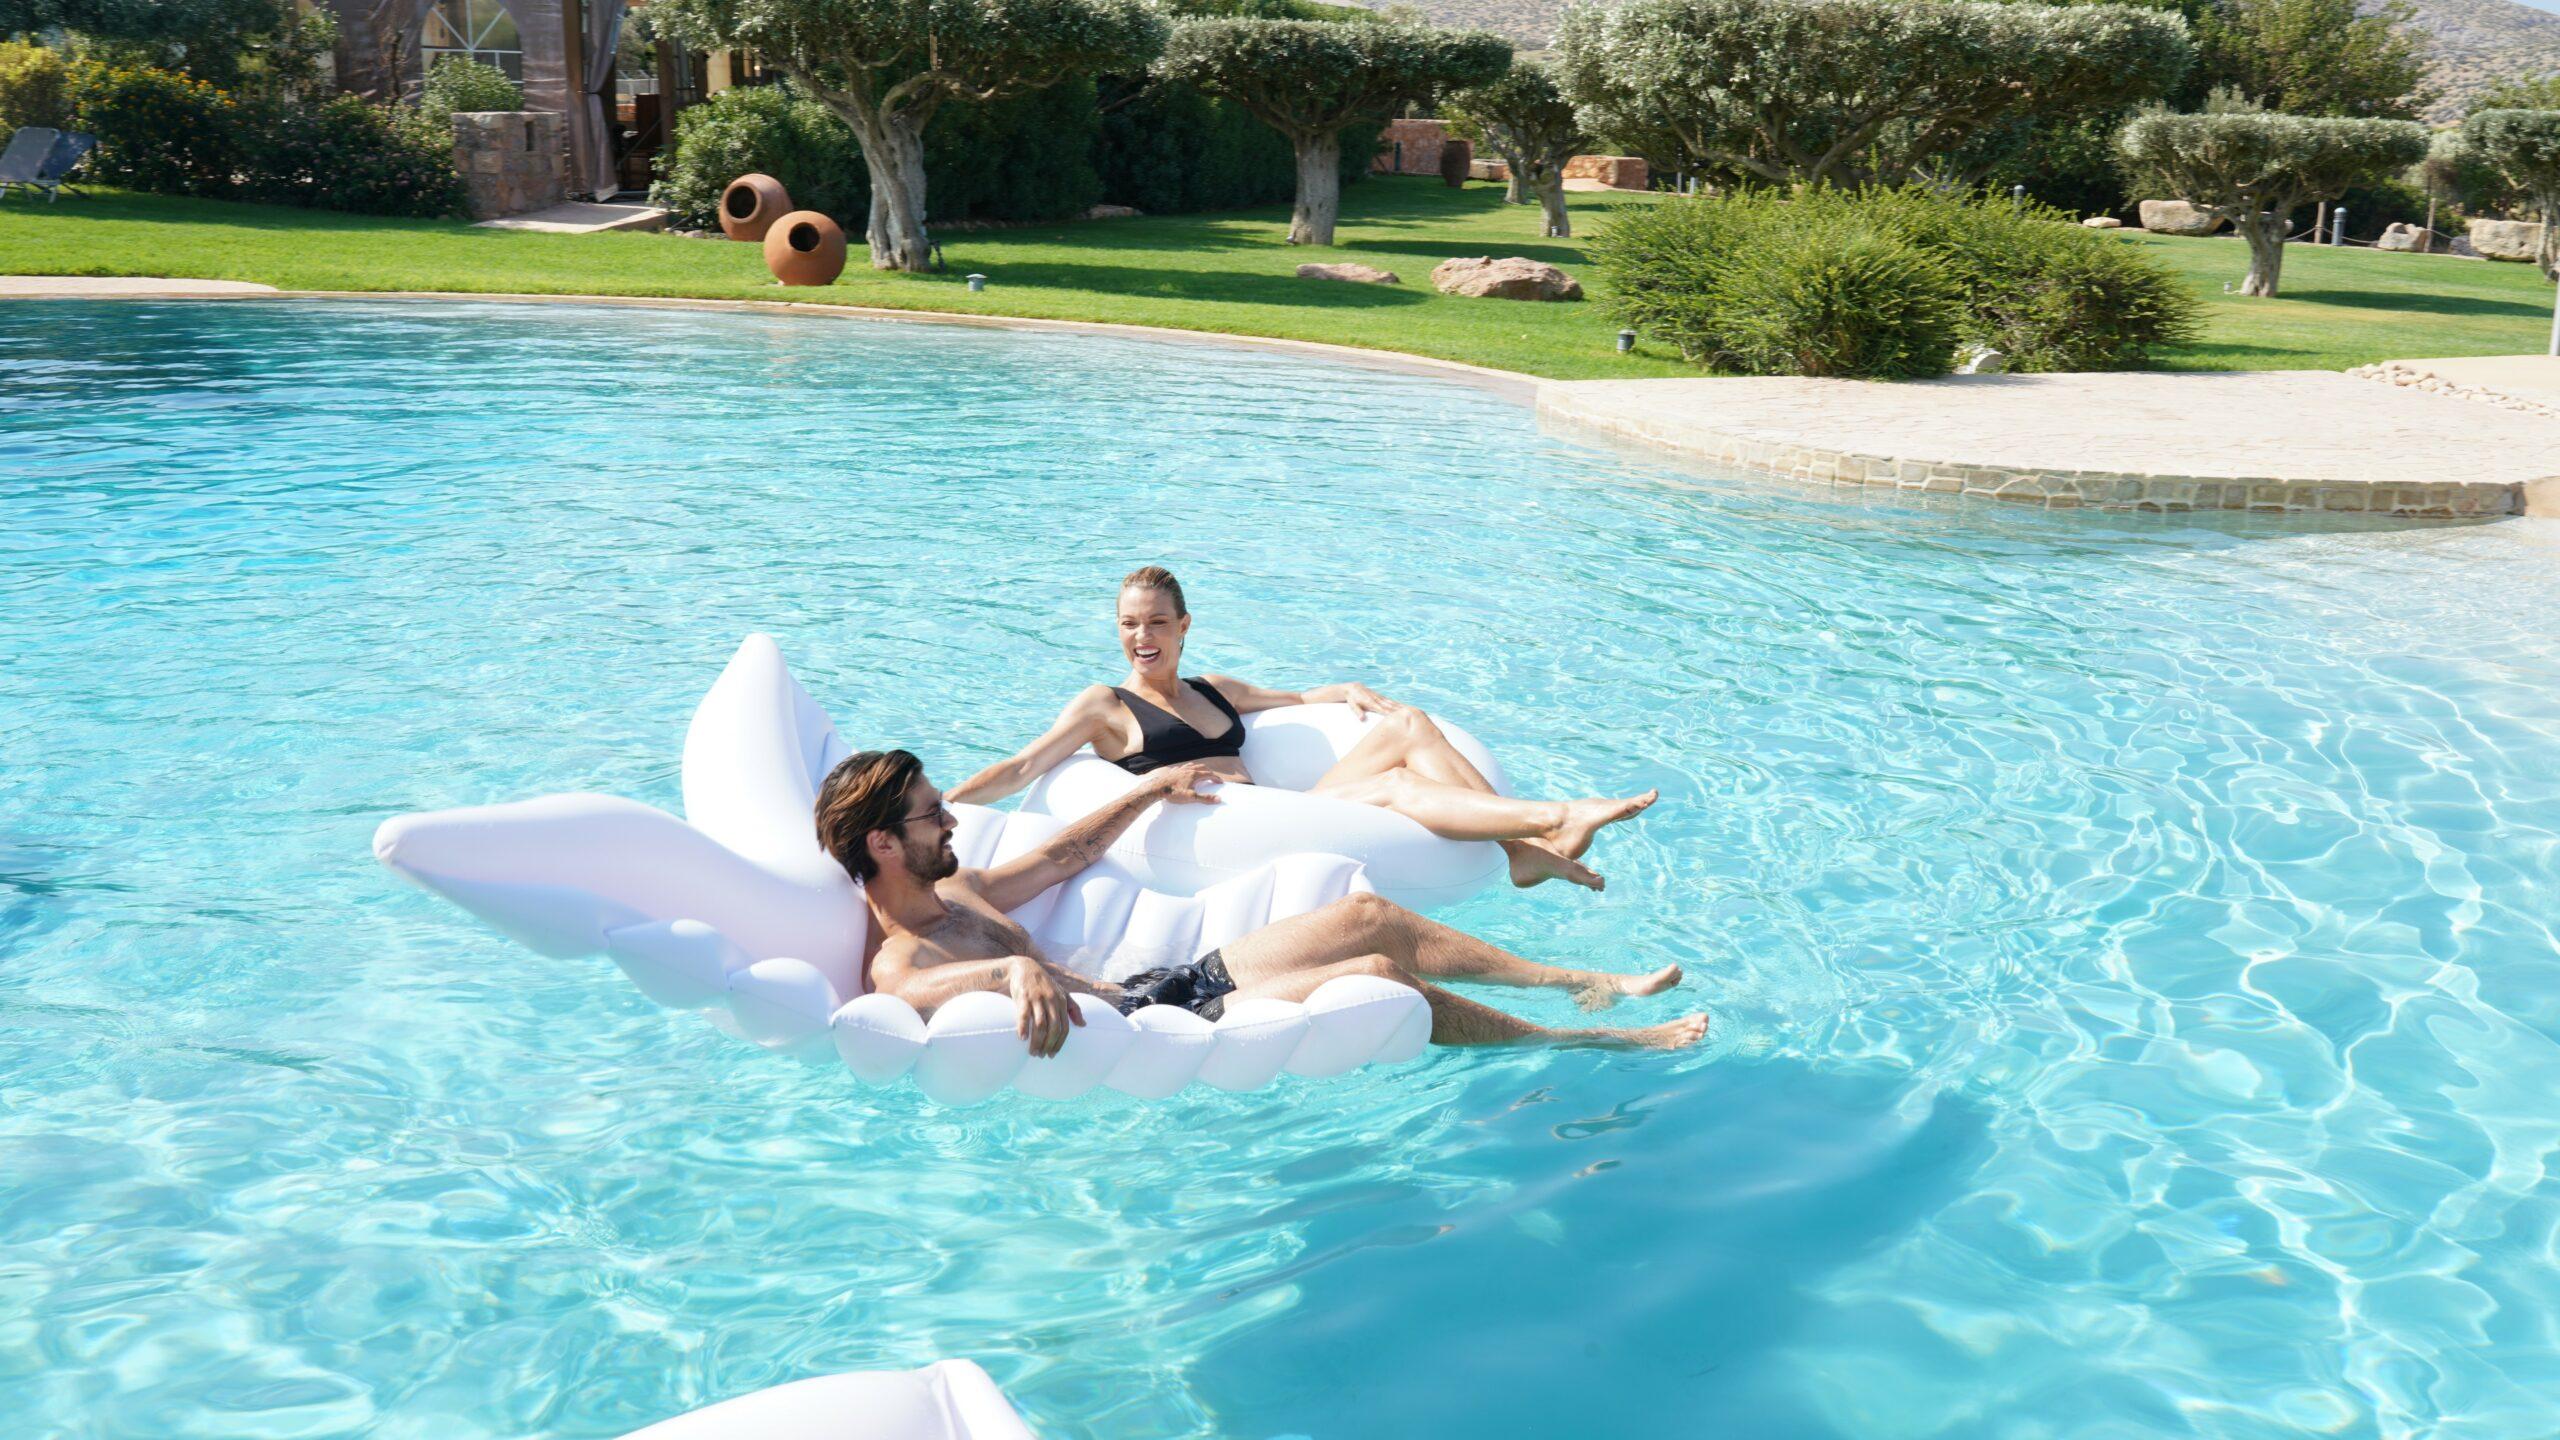 GNTM: Η Βίκυ Καγιά και ο Γιώργος Καράβας φόρεσαν τα μαγιό τους, βούτηξαν στην πισίνα και έκλεψαν τις εντυπώσεις (video)